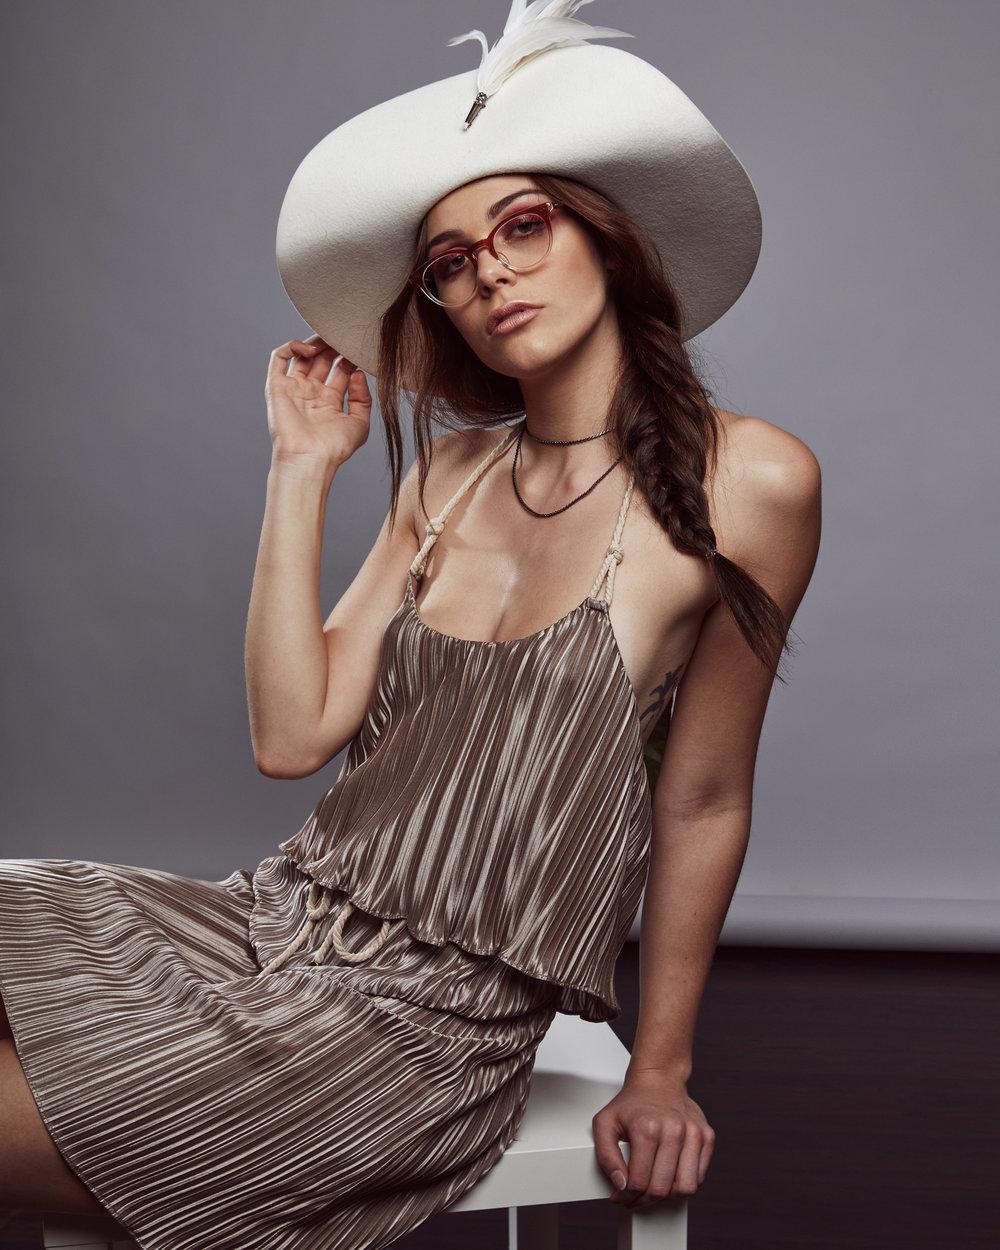 Photographer: Sergio Necoechea | Model: Ashley Warters | Styling: Landra Dulin//LA Fashion Week | Hair/Makeup by me